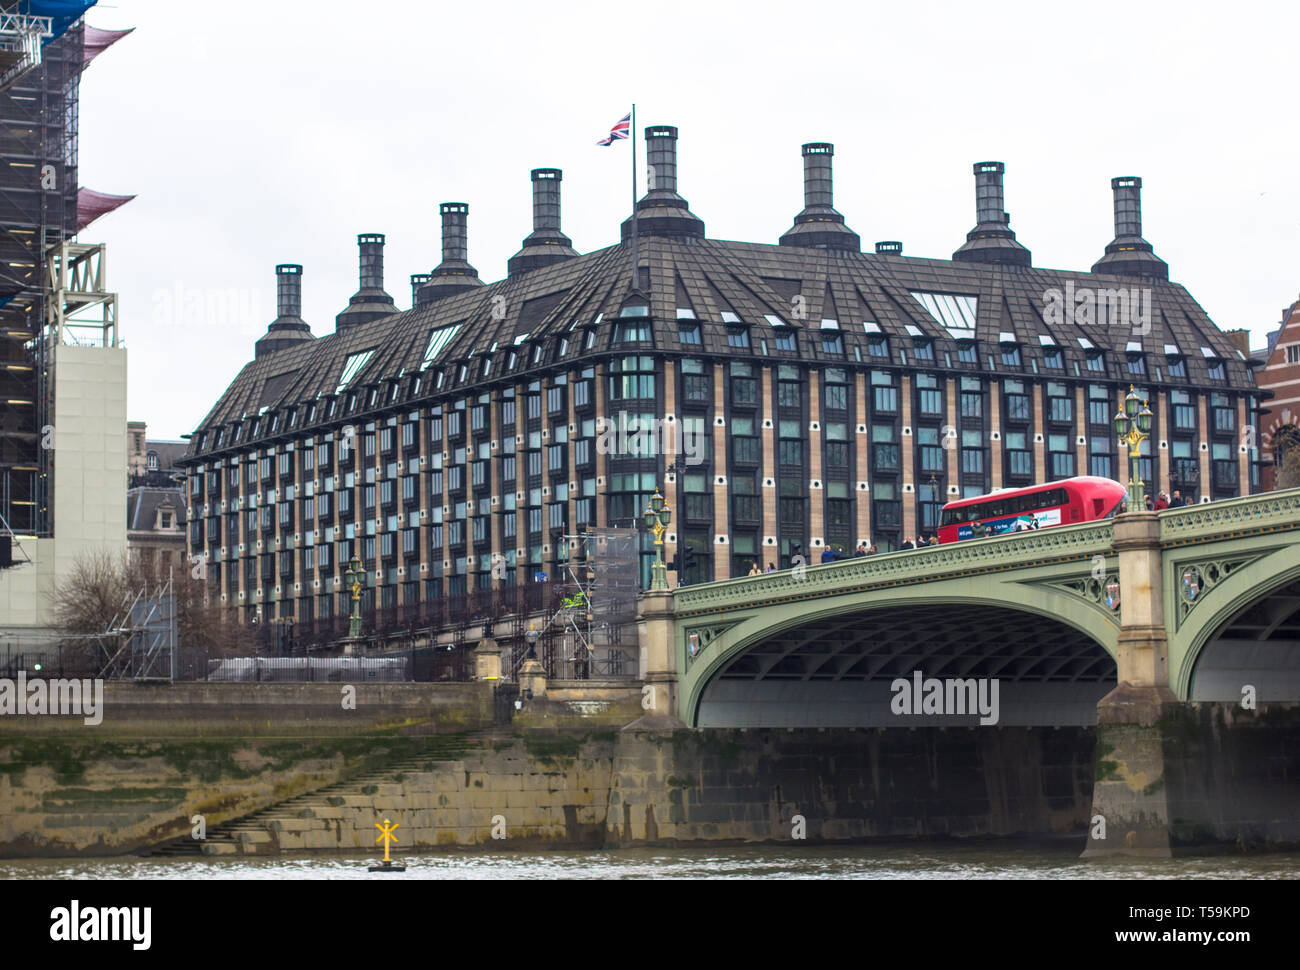 London, Great Britain. April 12, 2019. Portcullis House. 1 Parliament St, Westminster Bridge Road. - Stock Image